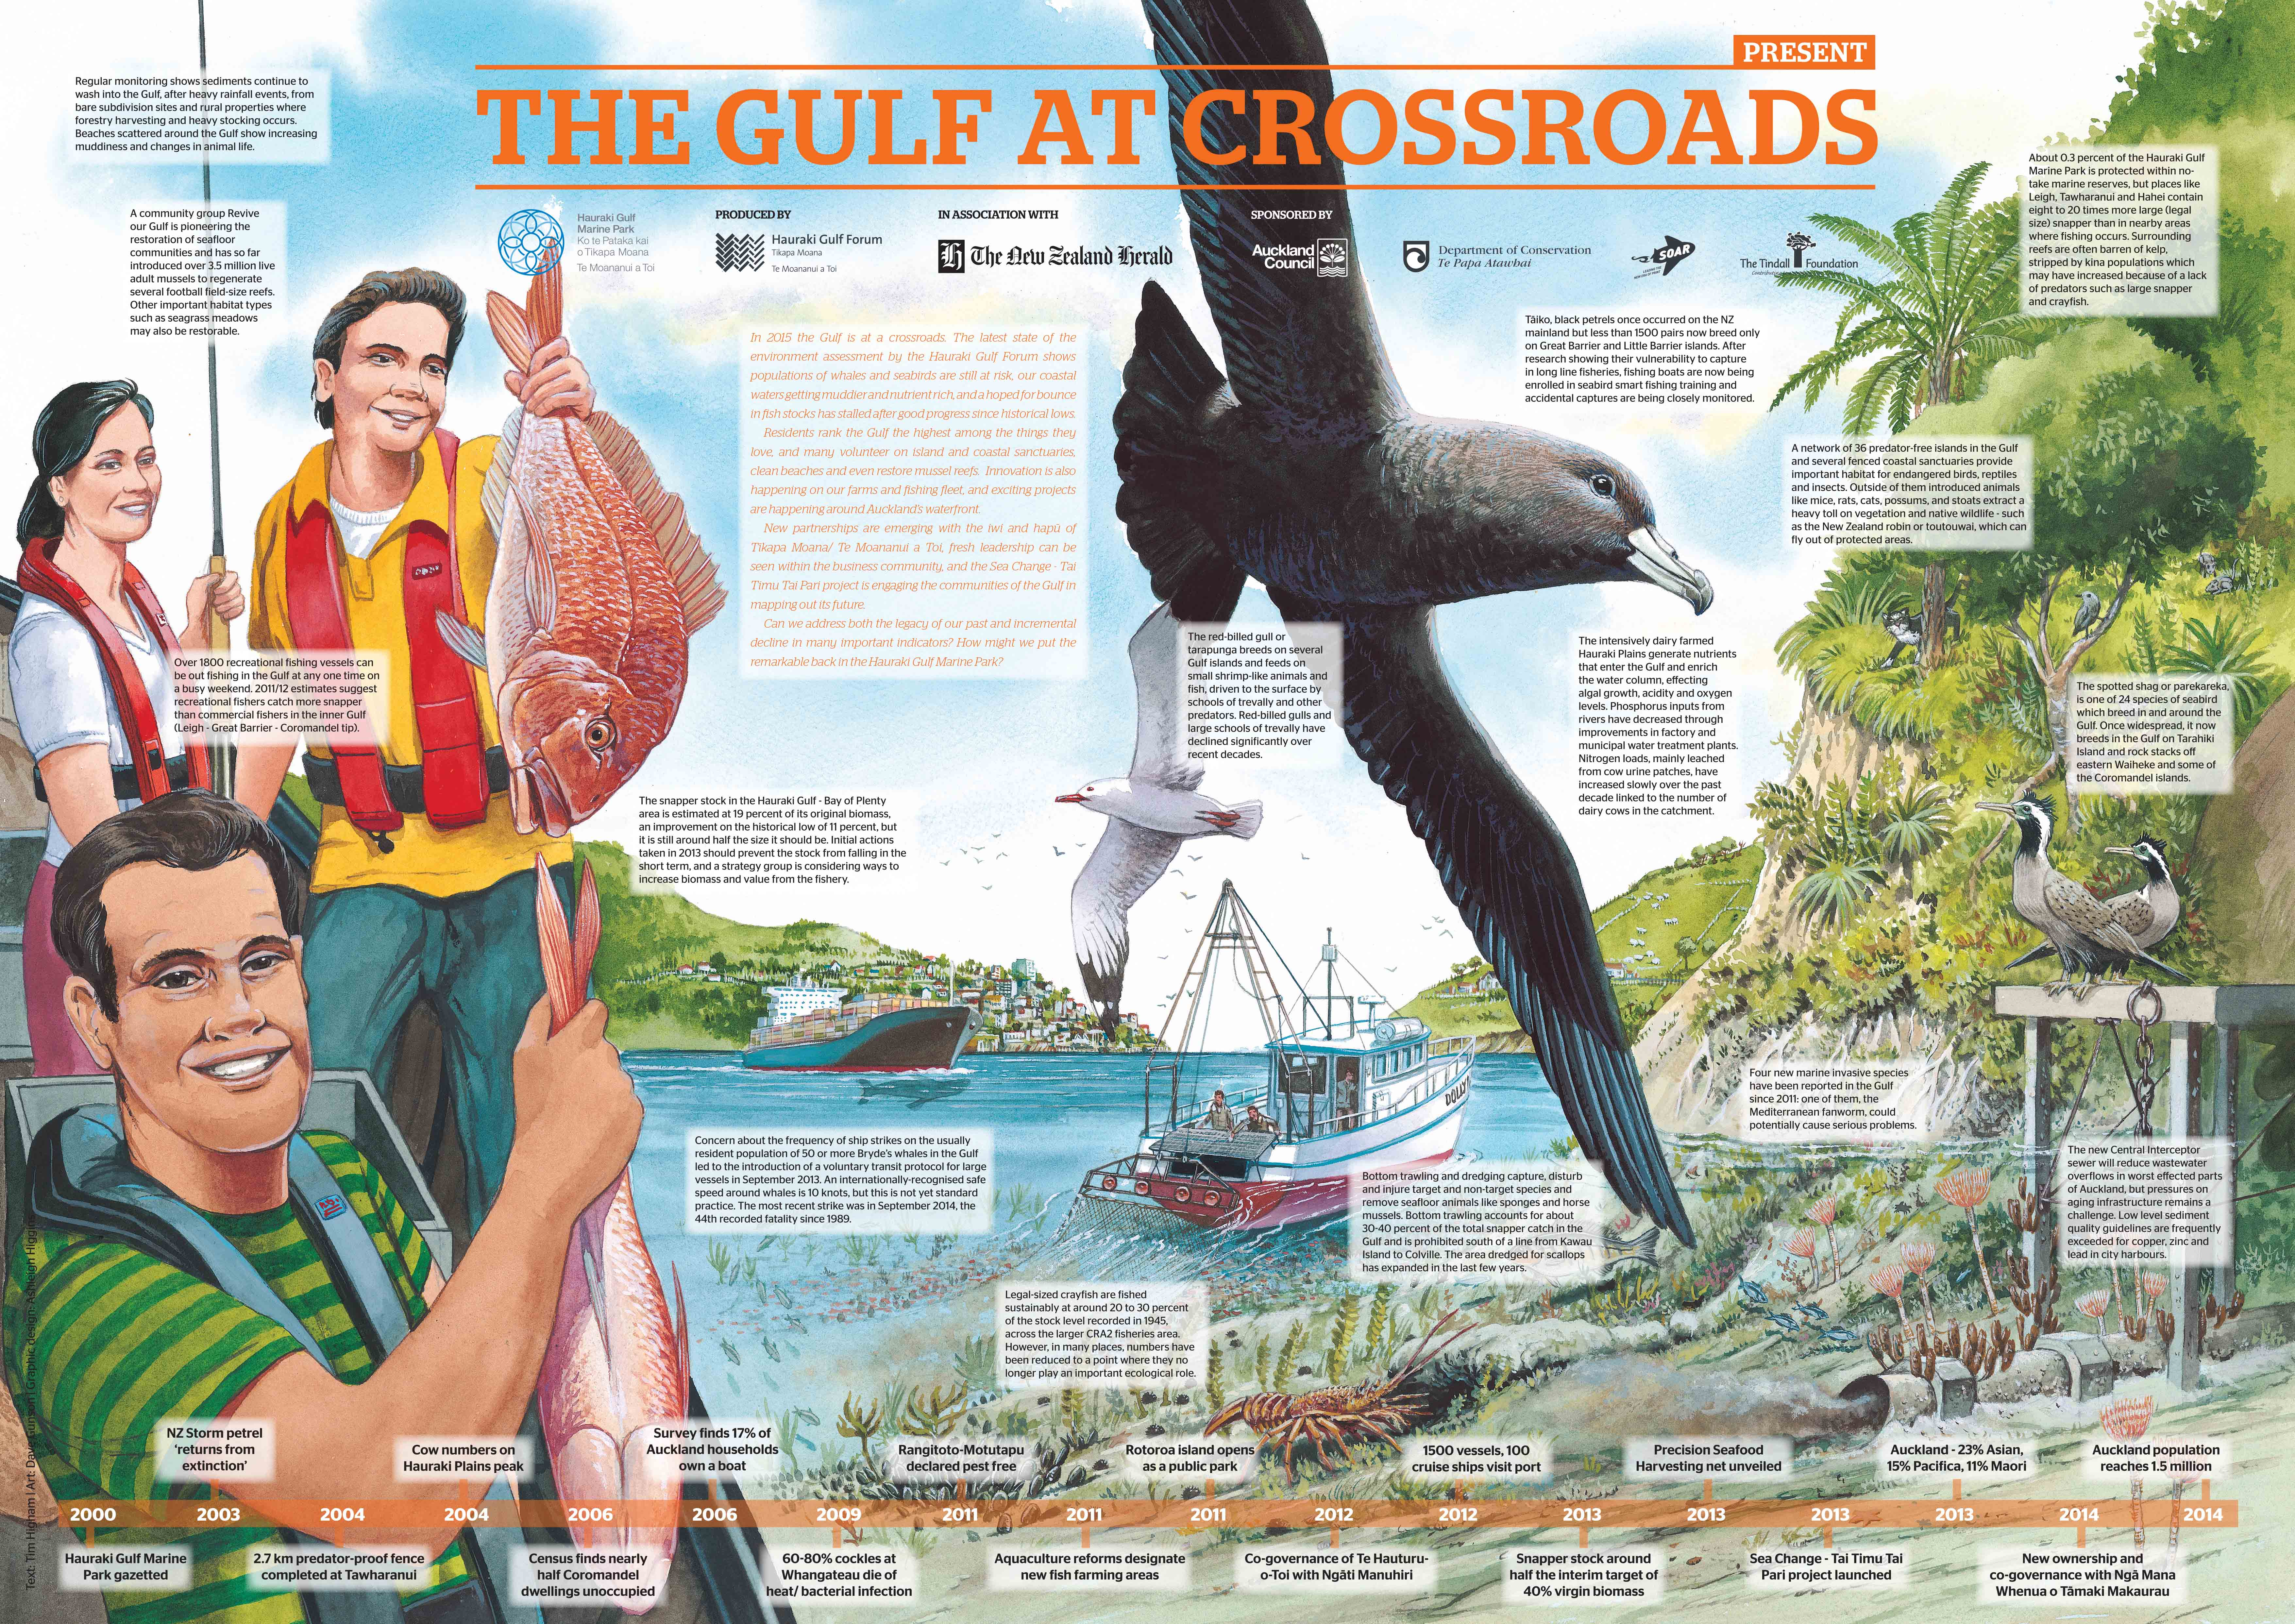 2015 The Gulf at Crossroads